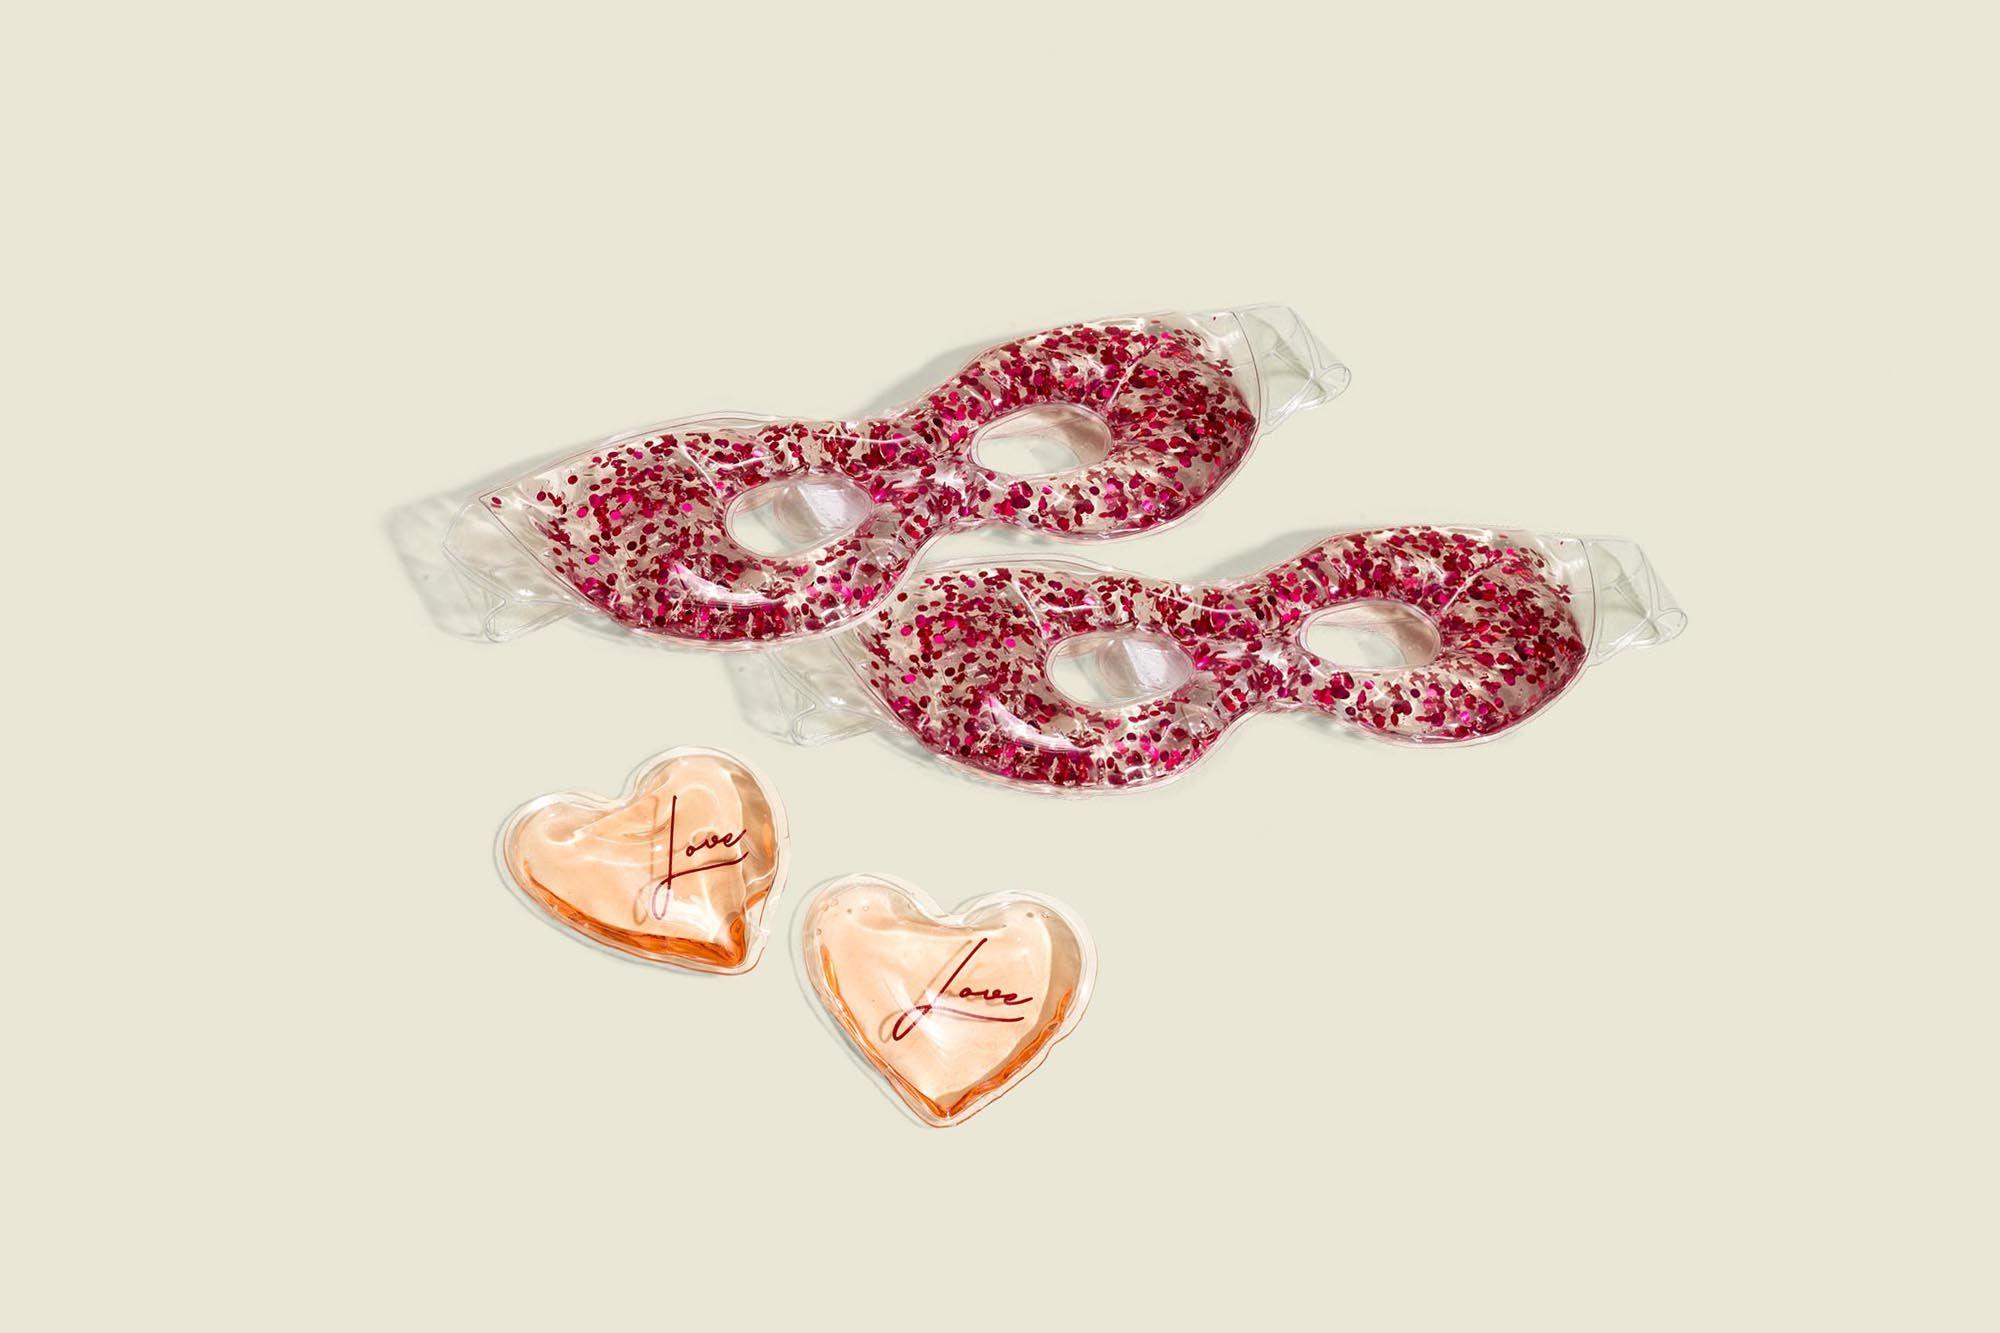 Flitter eye masks with heart shaped masks